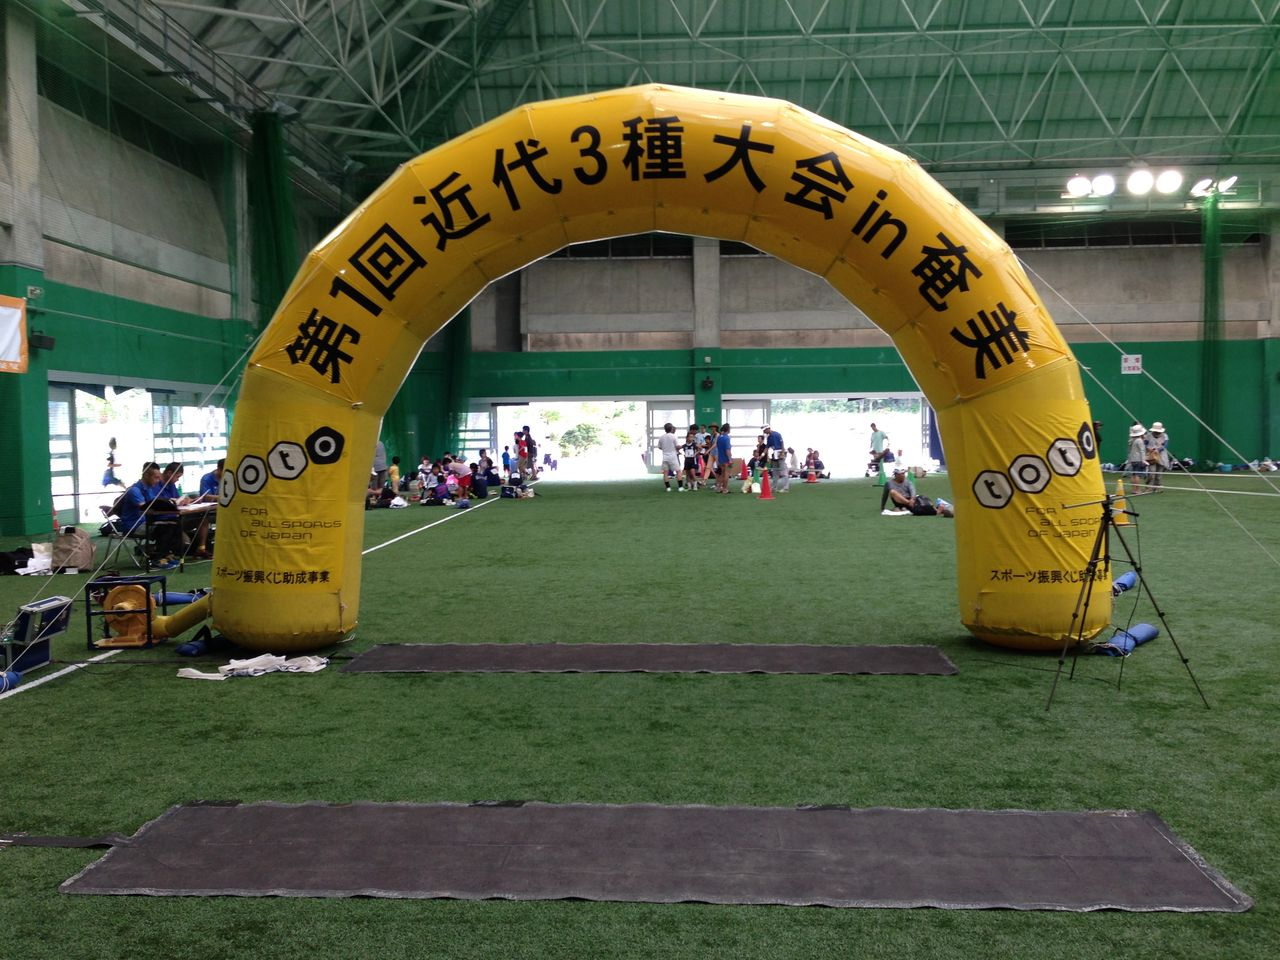 272fdf69b6 マラソンタイム計測(タイムキーパー)のブログ : 第1回近代3種大会 in ...